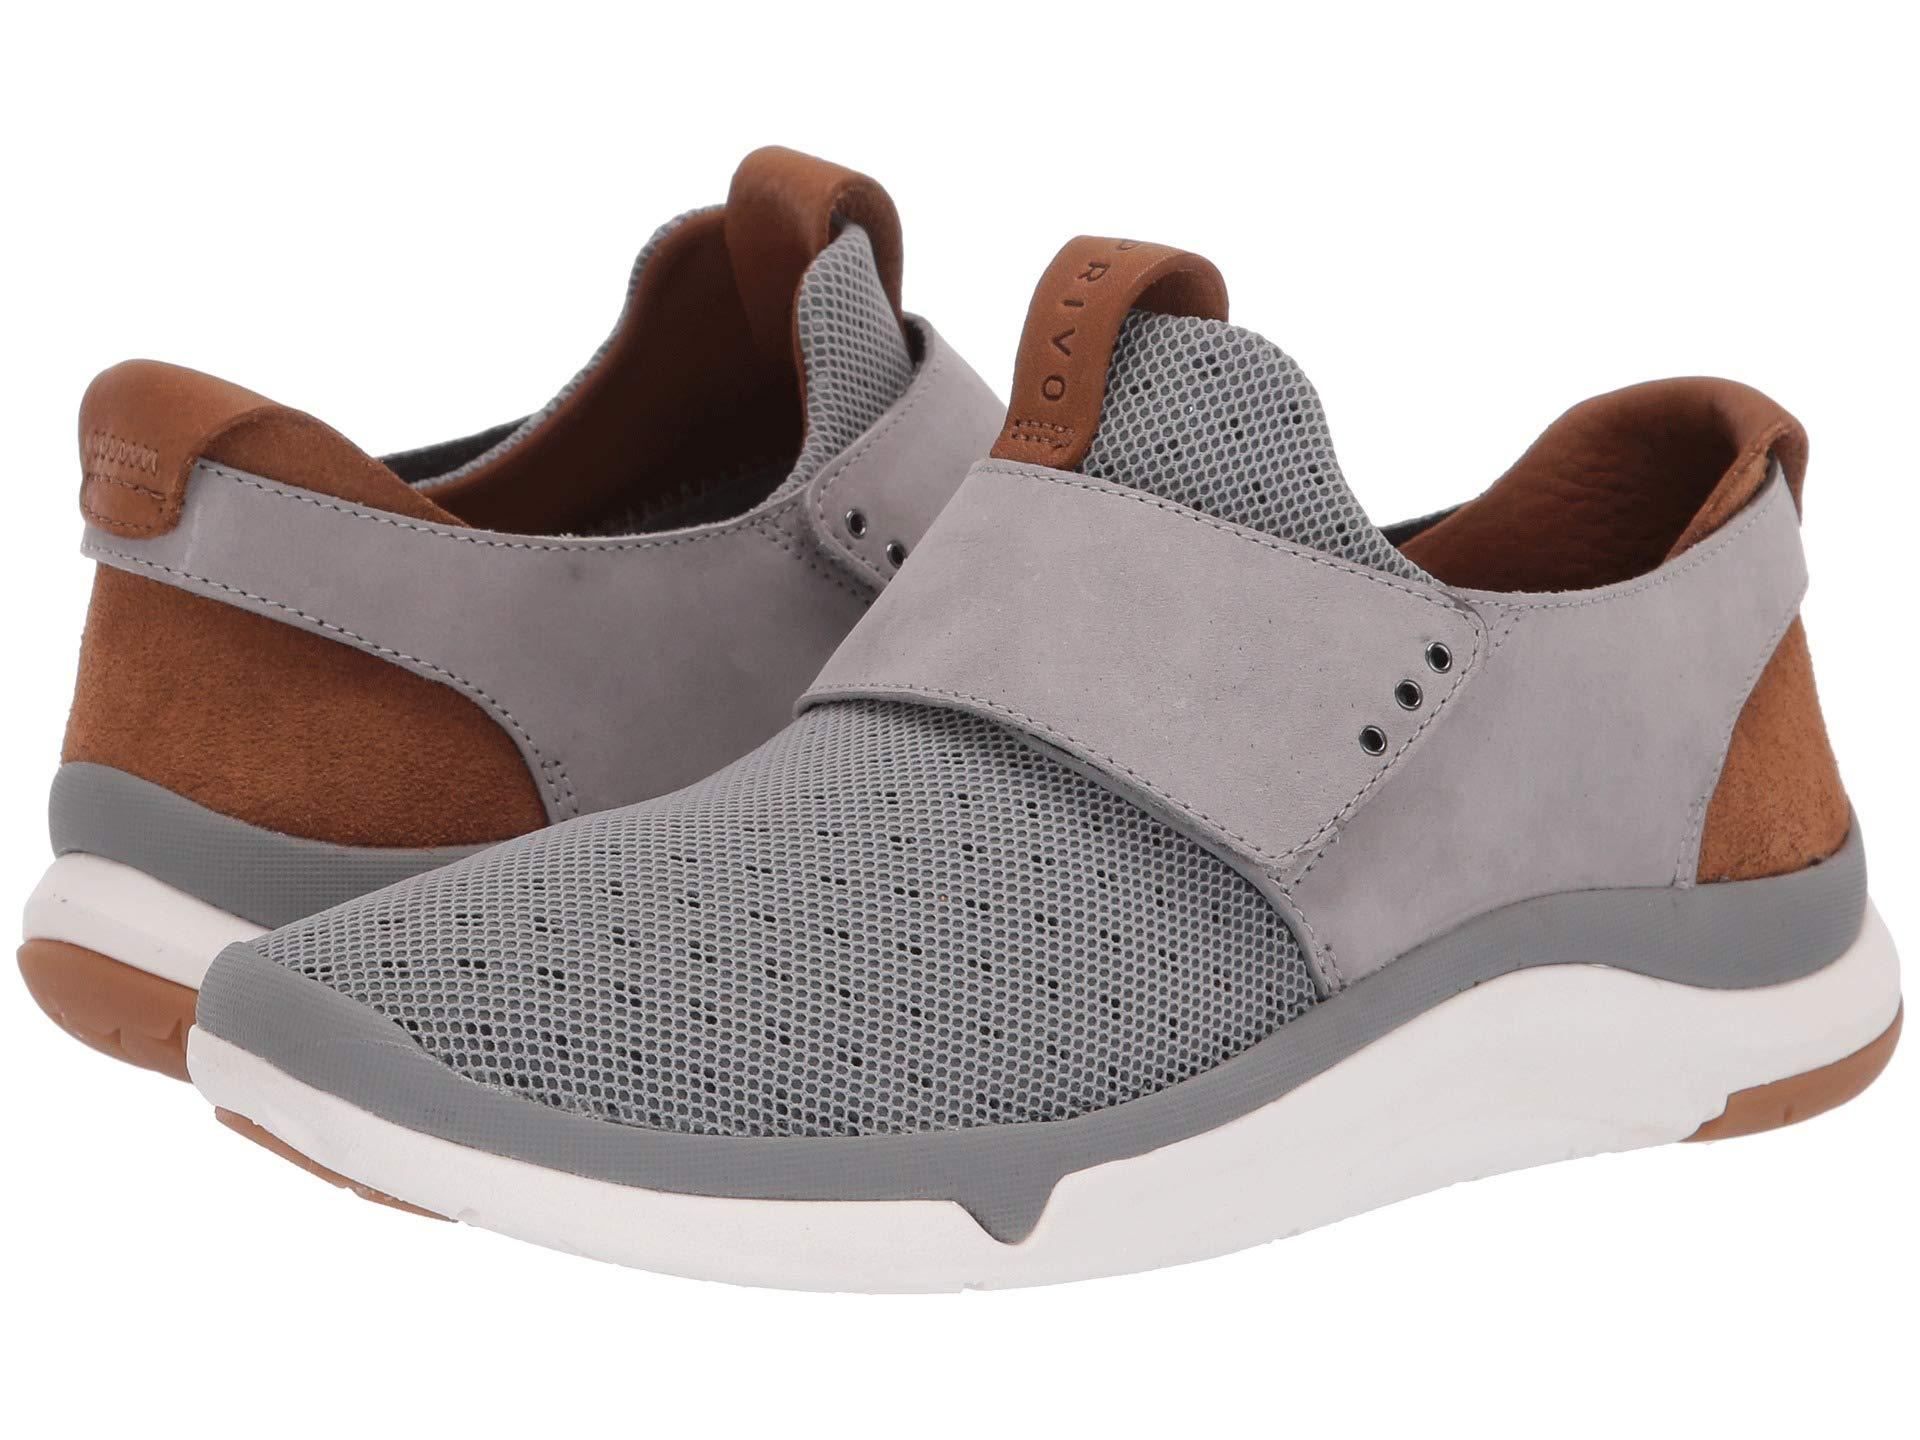 52593a66b385 Lyst - Clarks Privo Flux (navy) Women s Shoes in Gray